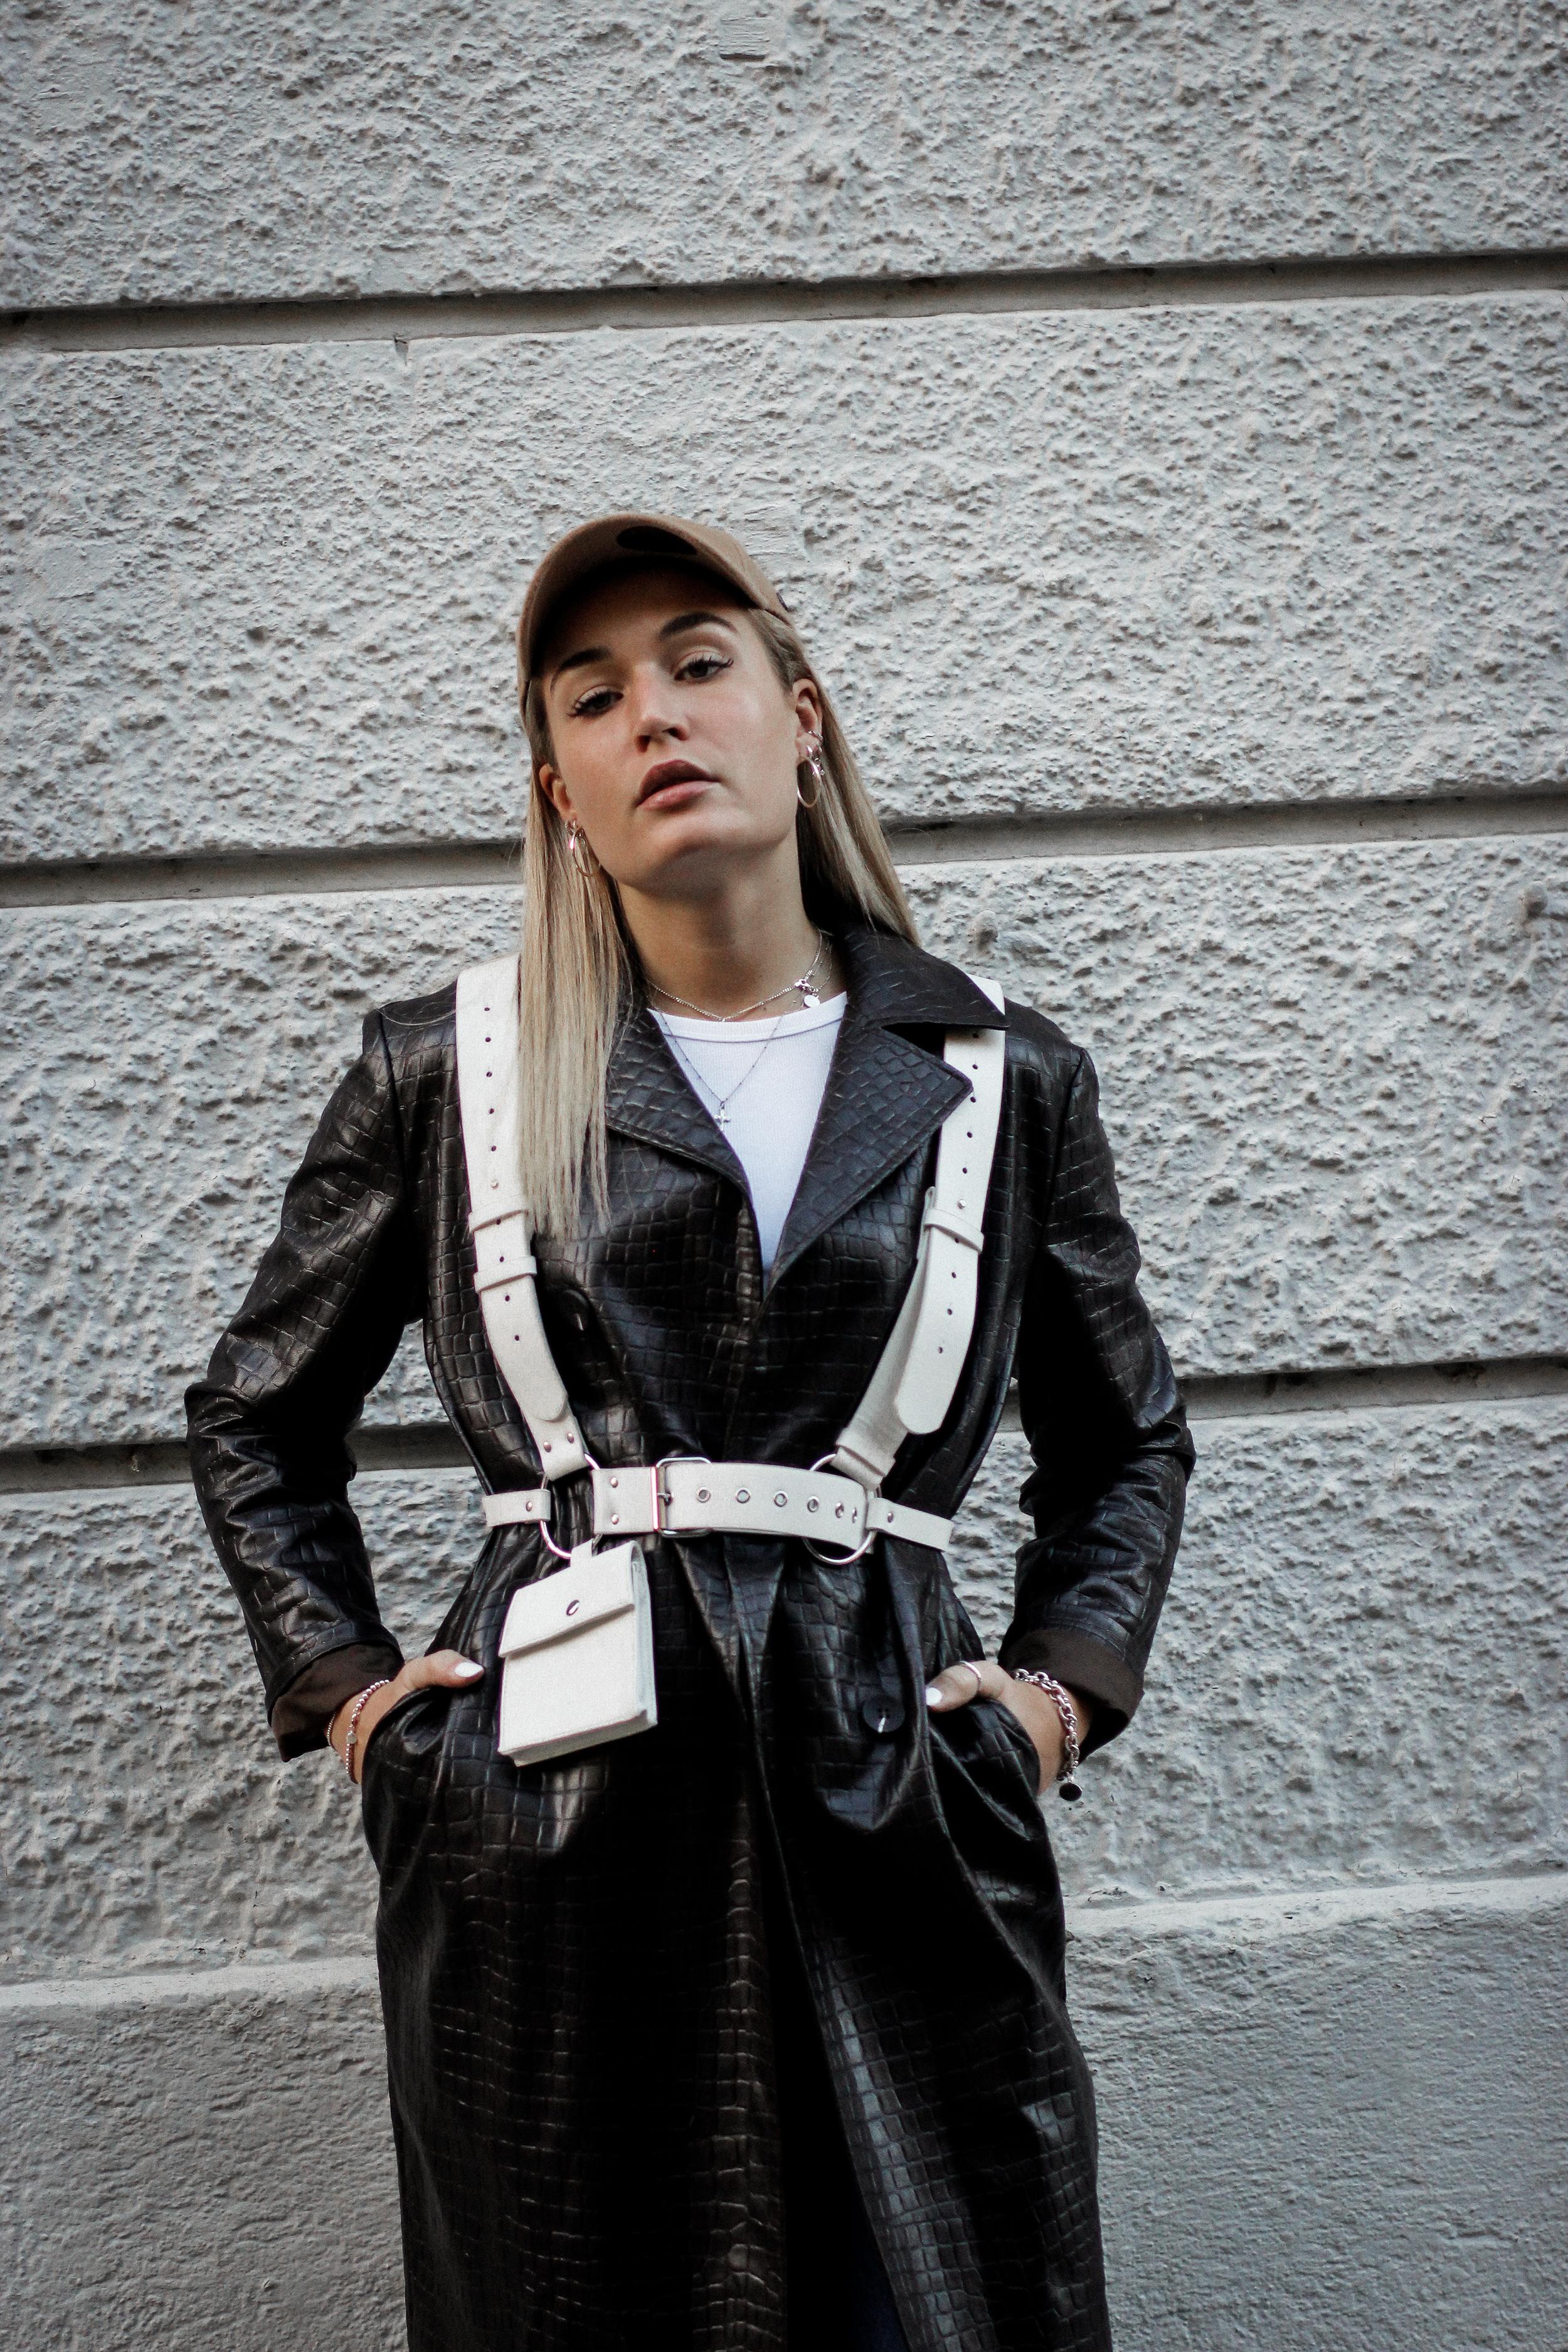 Lauralamode Fashion Blogger Fashionblogger Mantel Coat Herbst Herbsttrend Leather Coat Ledermantel Streetstyle Look Ootd Munich Berlin Deutschland8